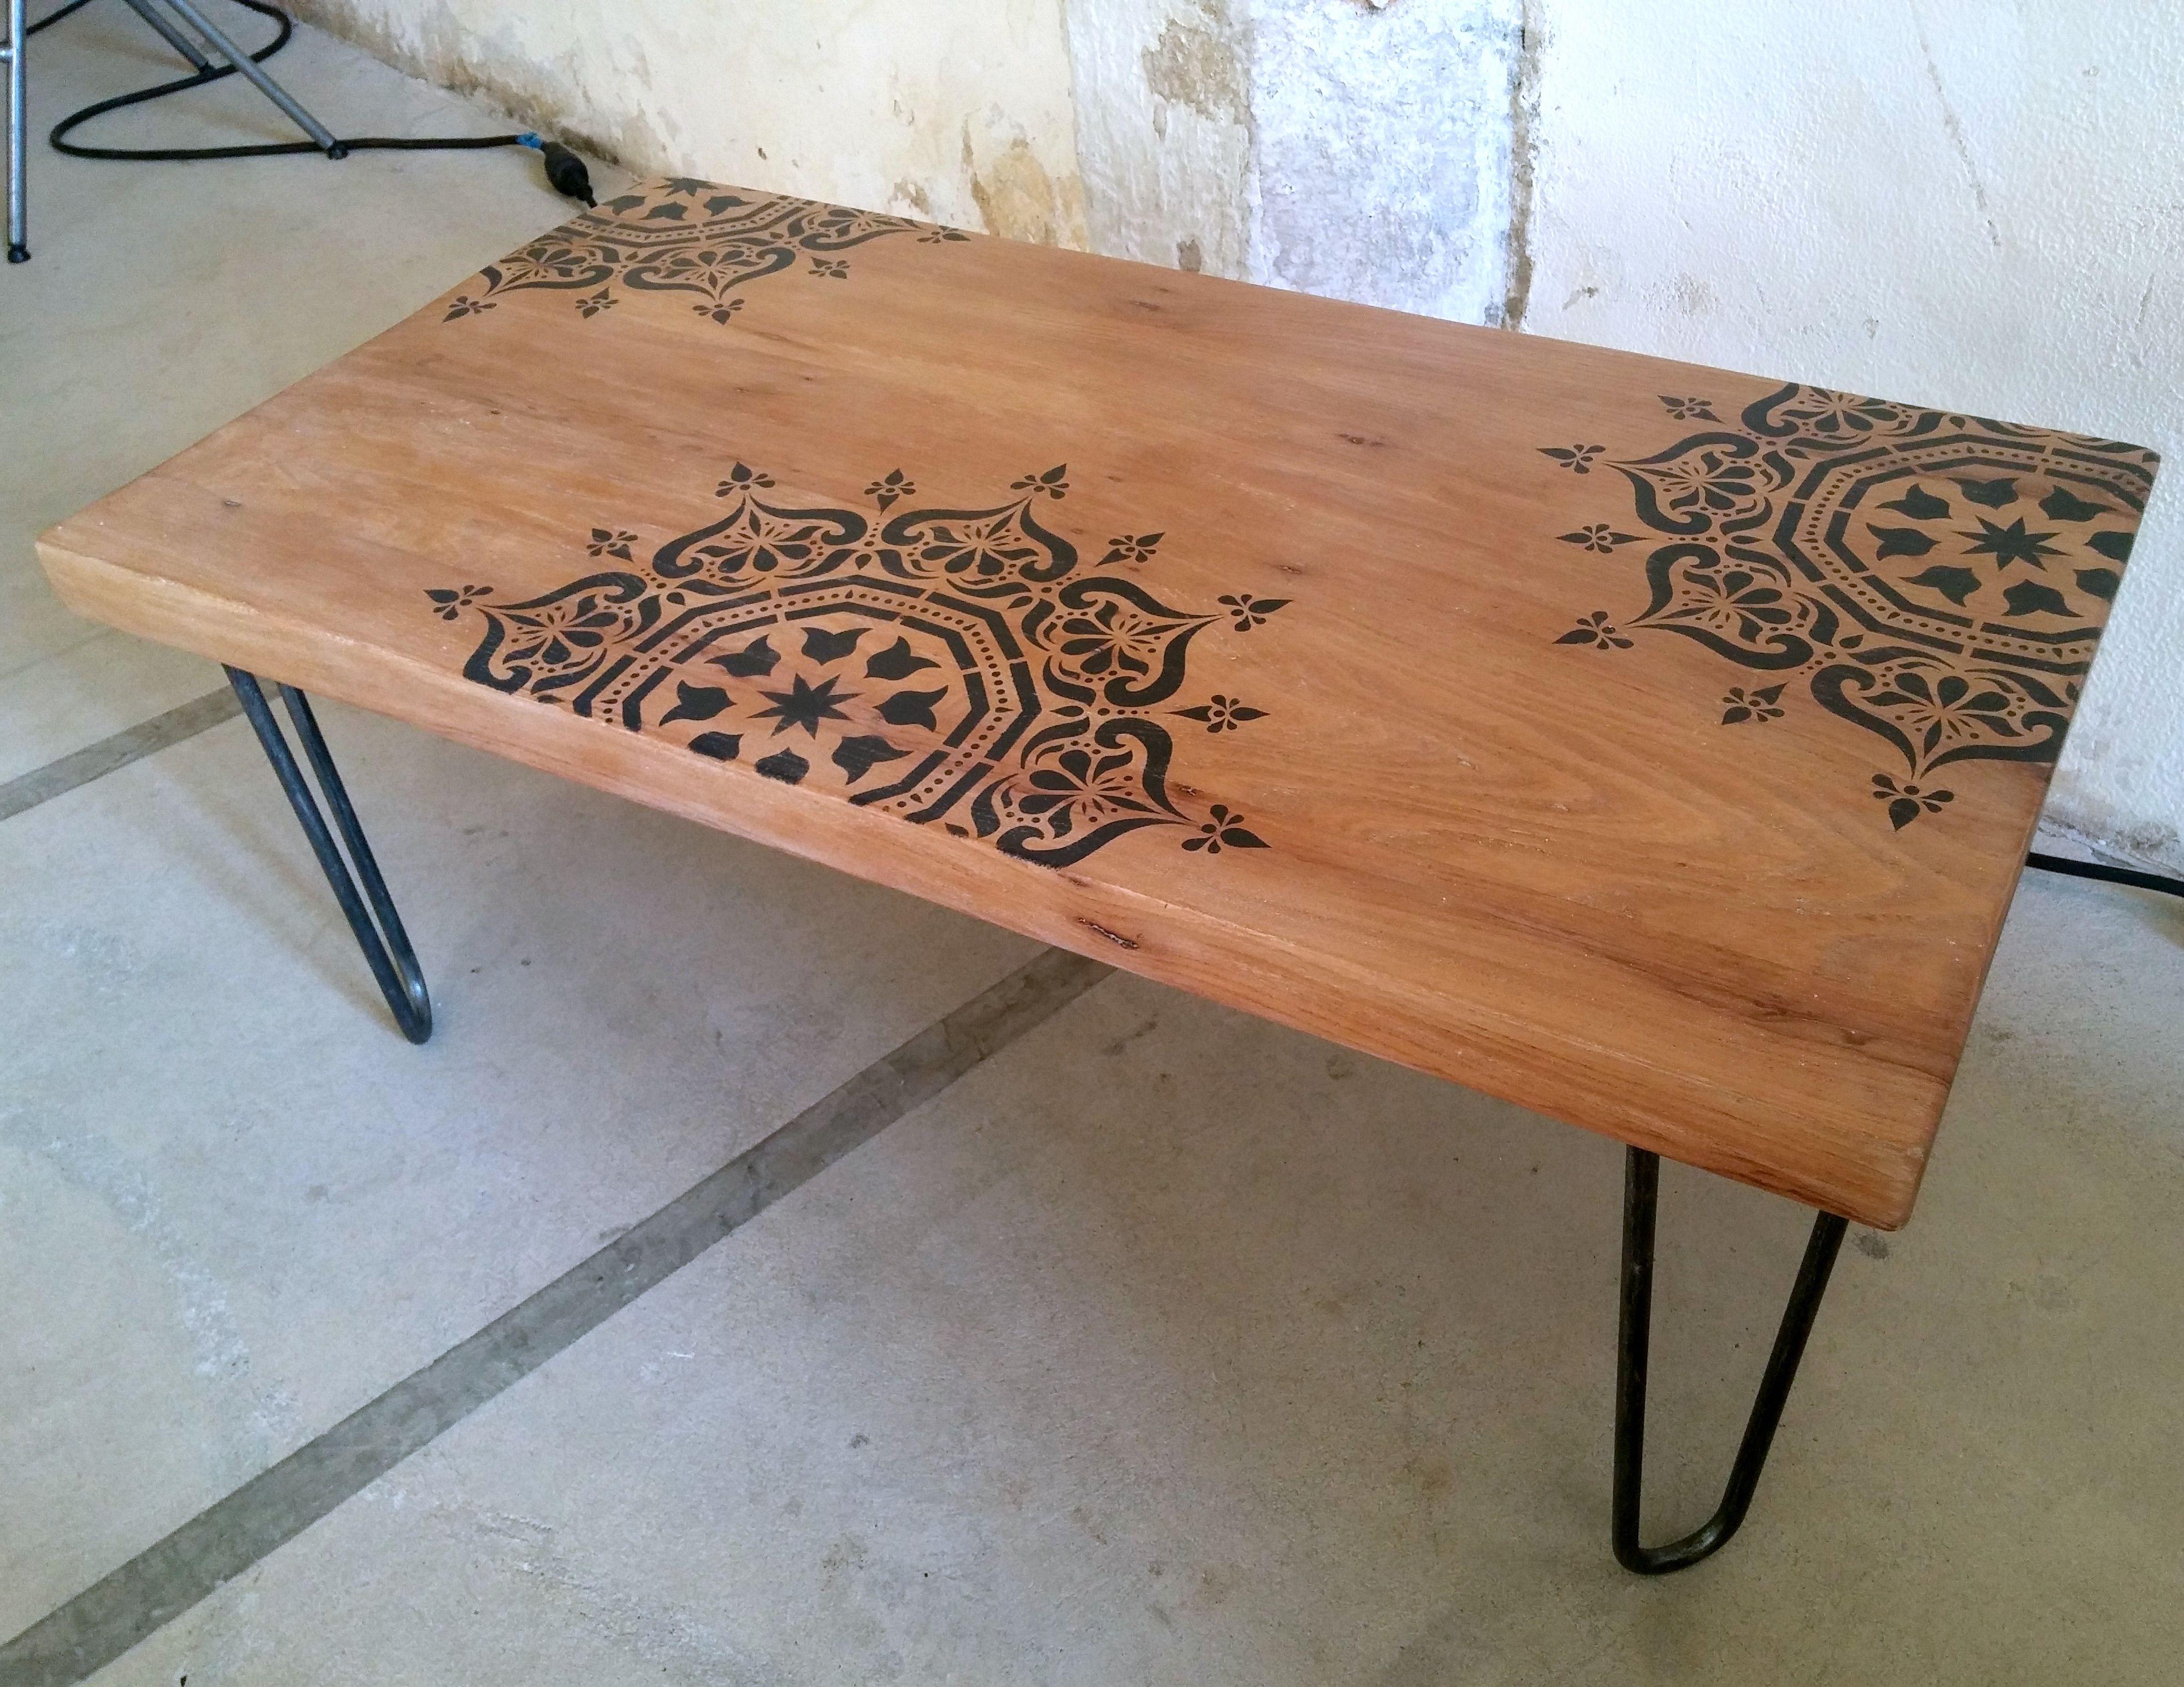 Table basse bois massif sur hairpin legs motif pochoir inspiration ...